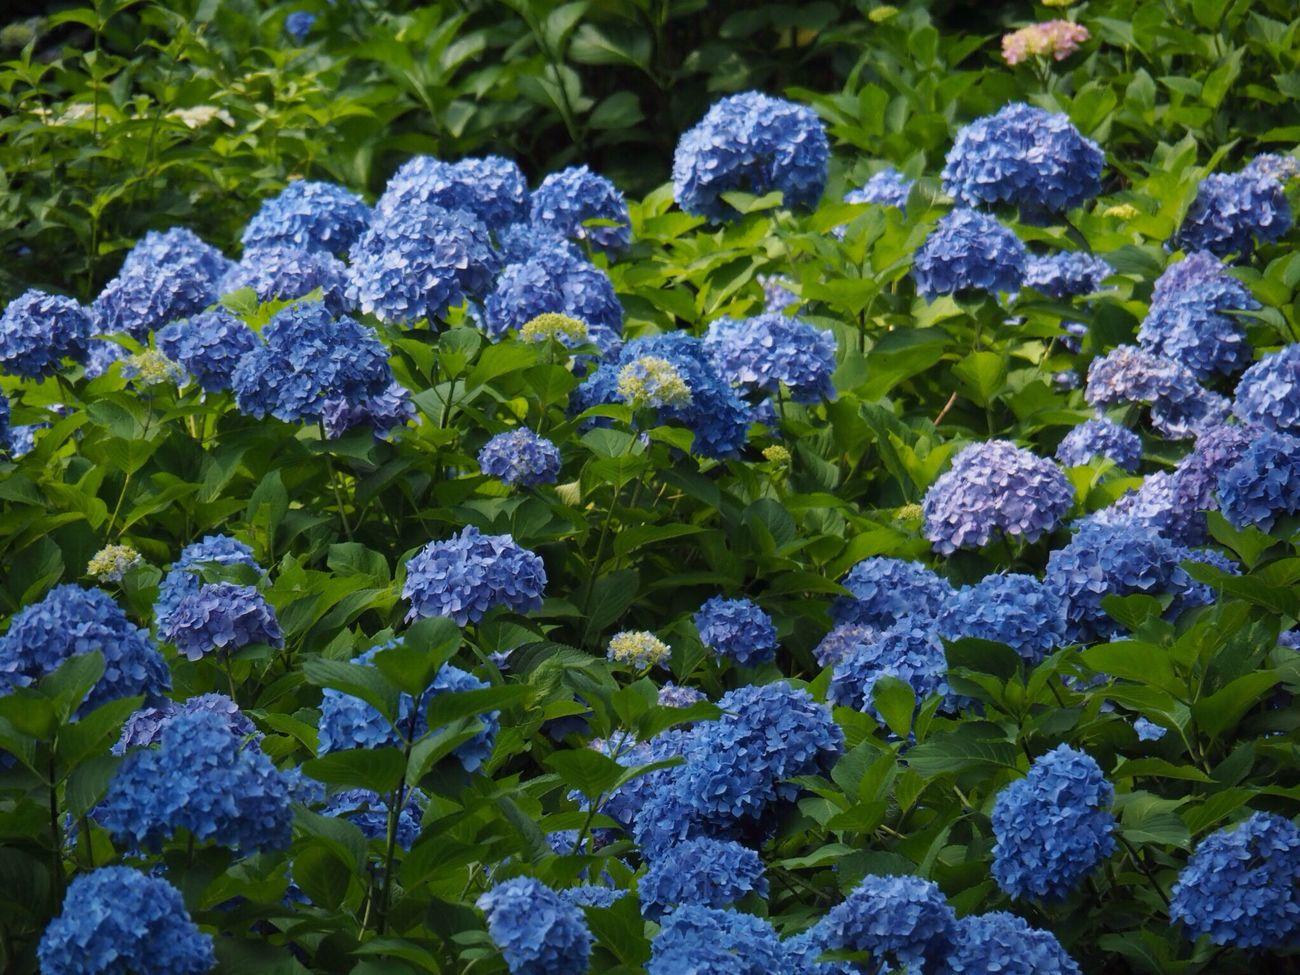 Kyoto Japan Uji Mimurotoji Temple Hydrangea Flowers Blue Growth Nature Plant Purple Beauty In Nature Day Outdoors No People Olympus PEN-F 京都 日本 宇治 三室戸寺 紫陽花